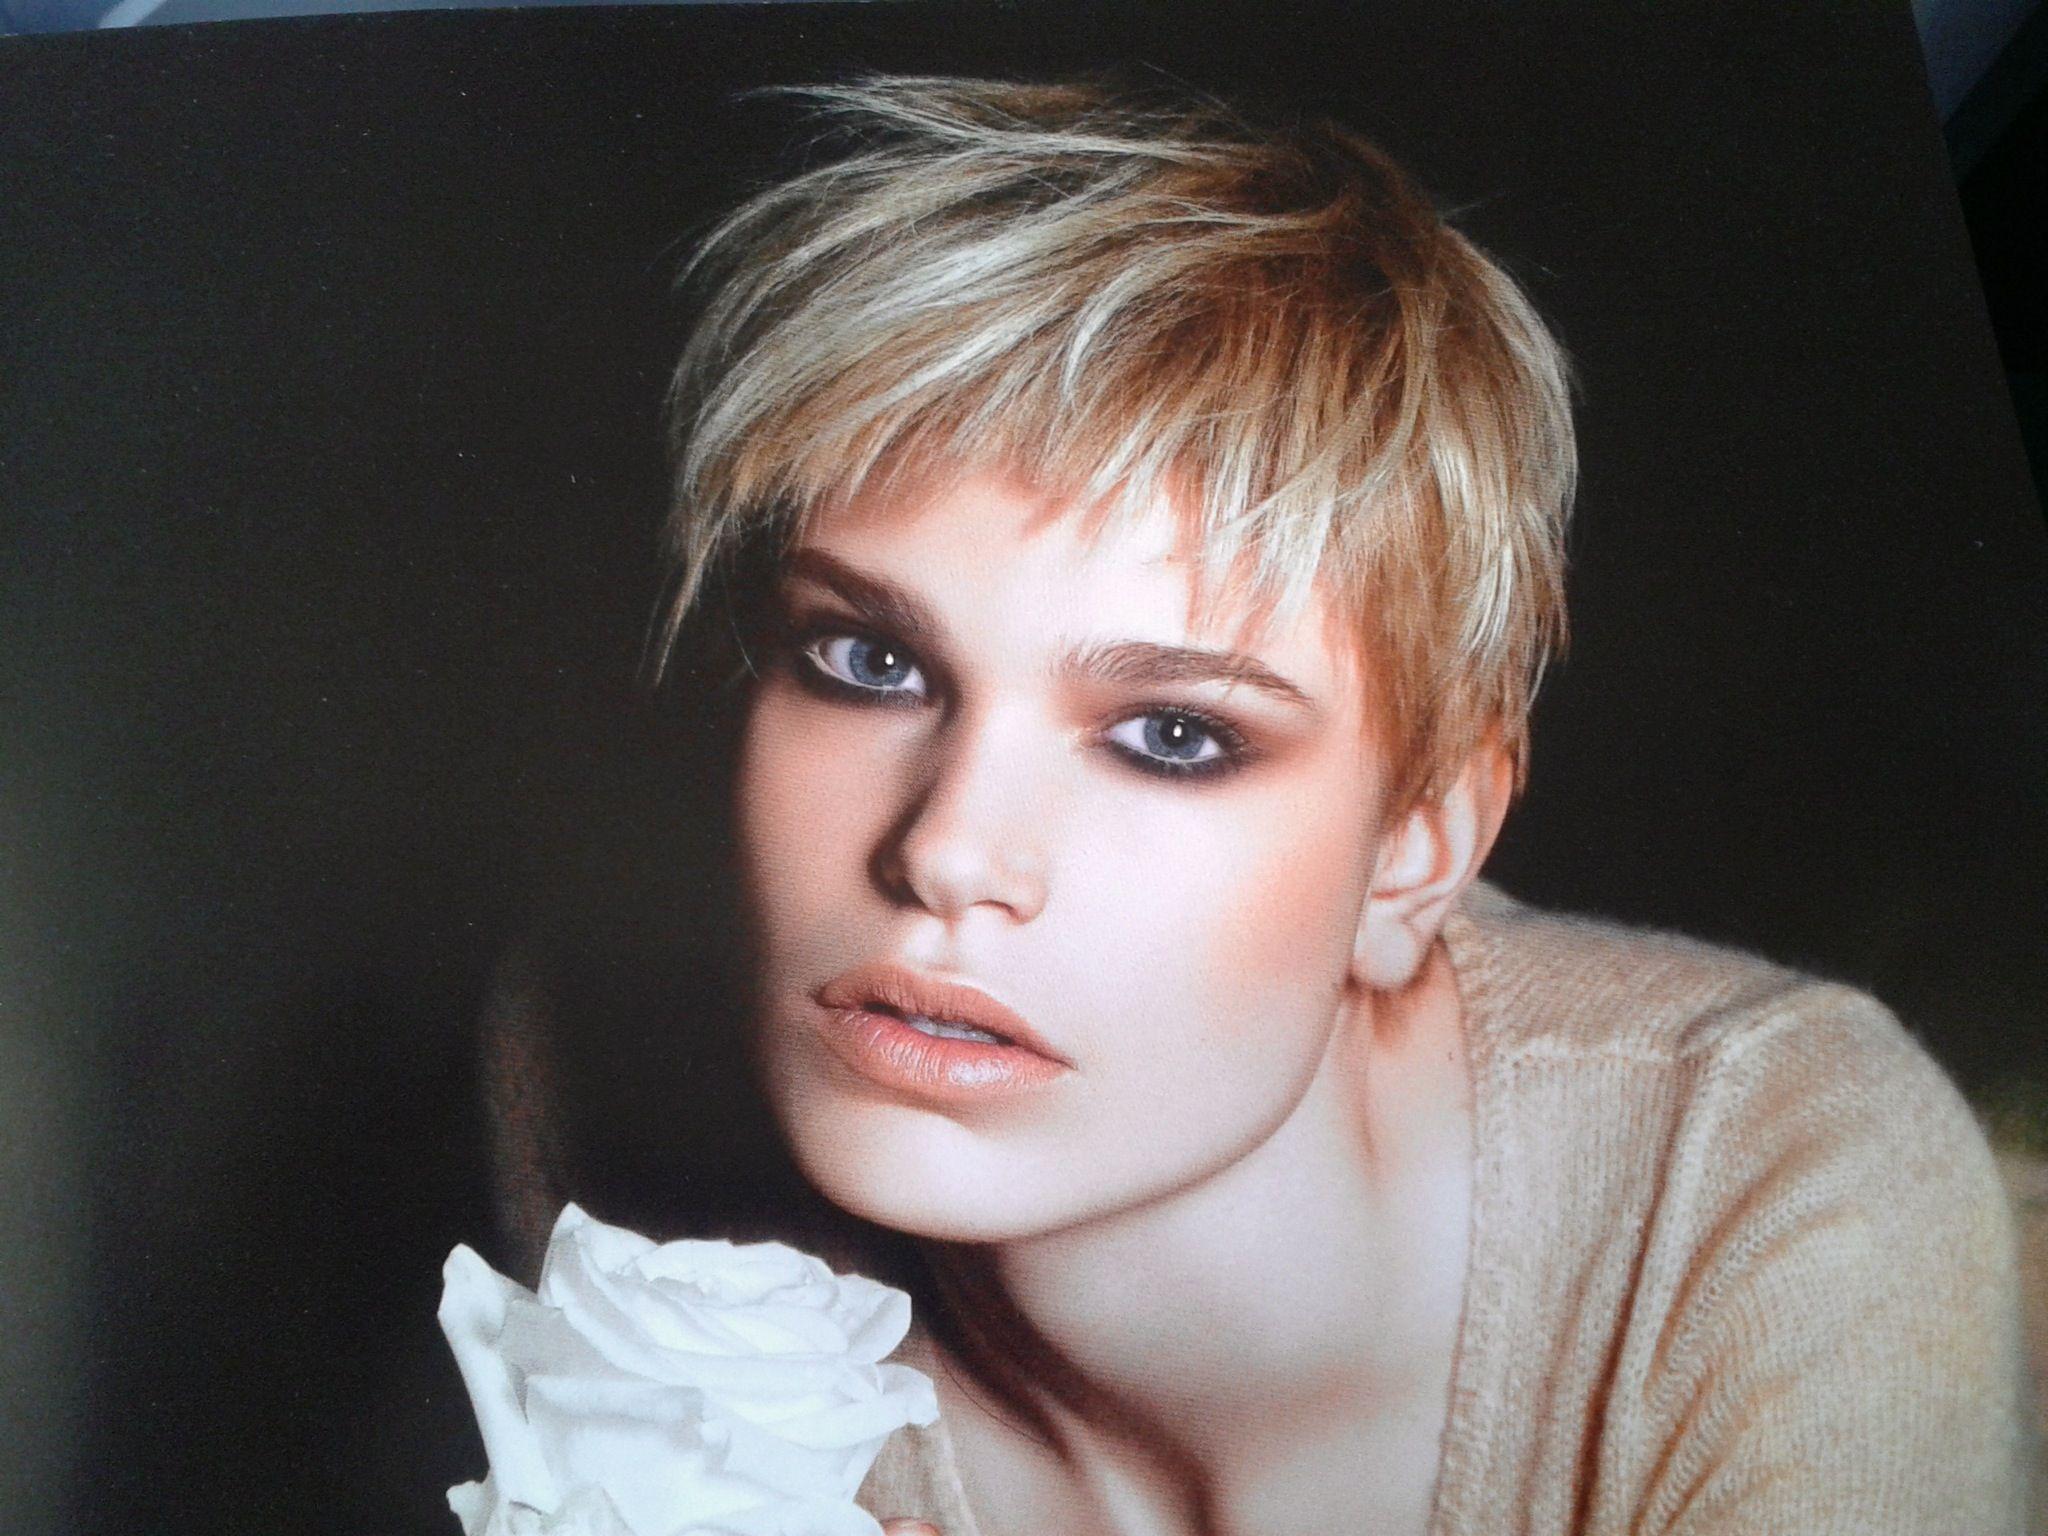 Pin by marie decaux on beauté cheveux courts short hair pinterest